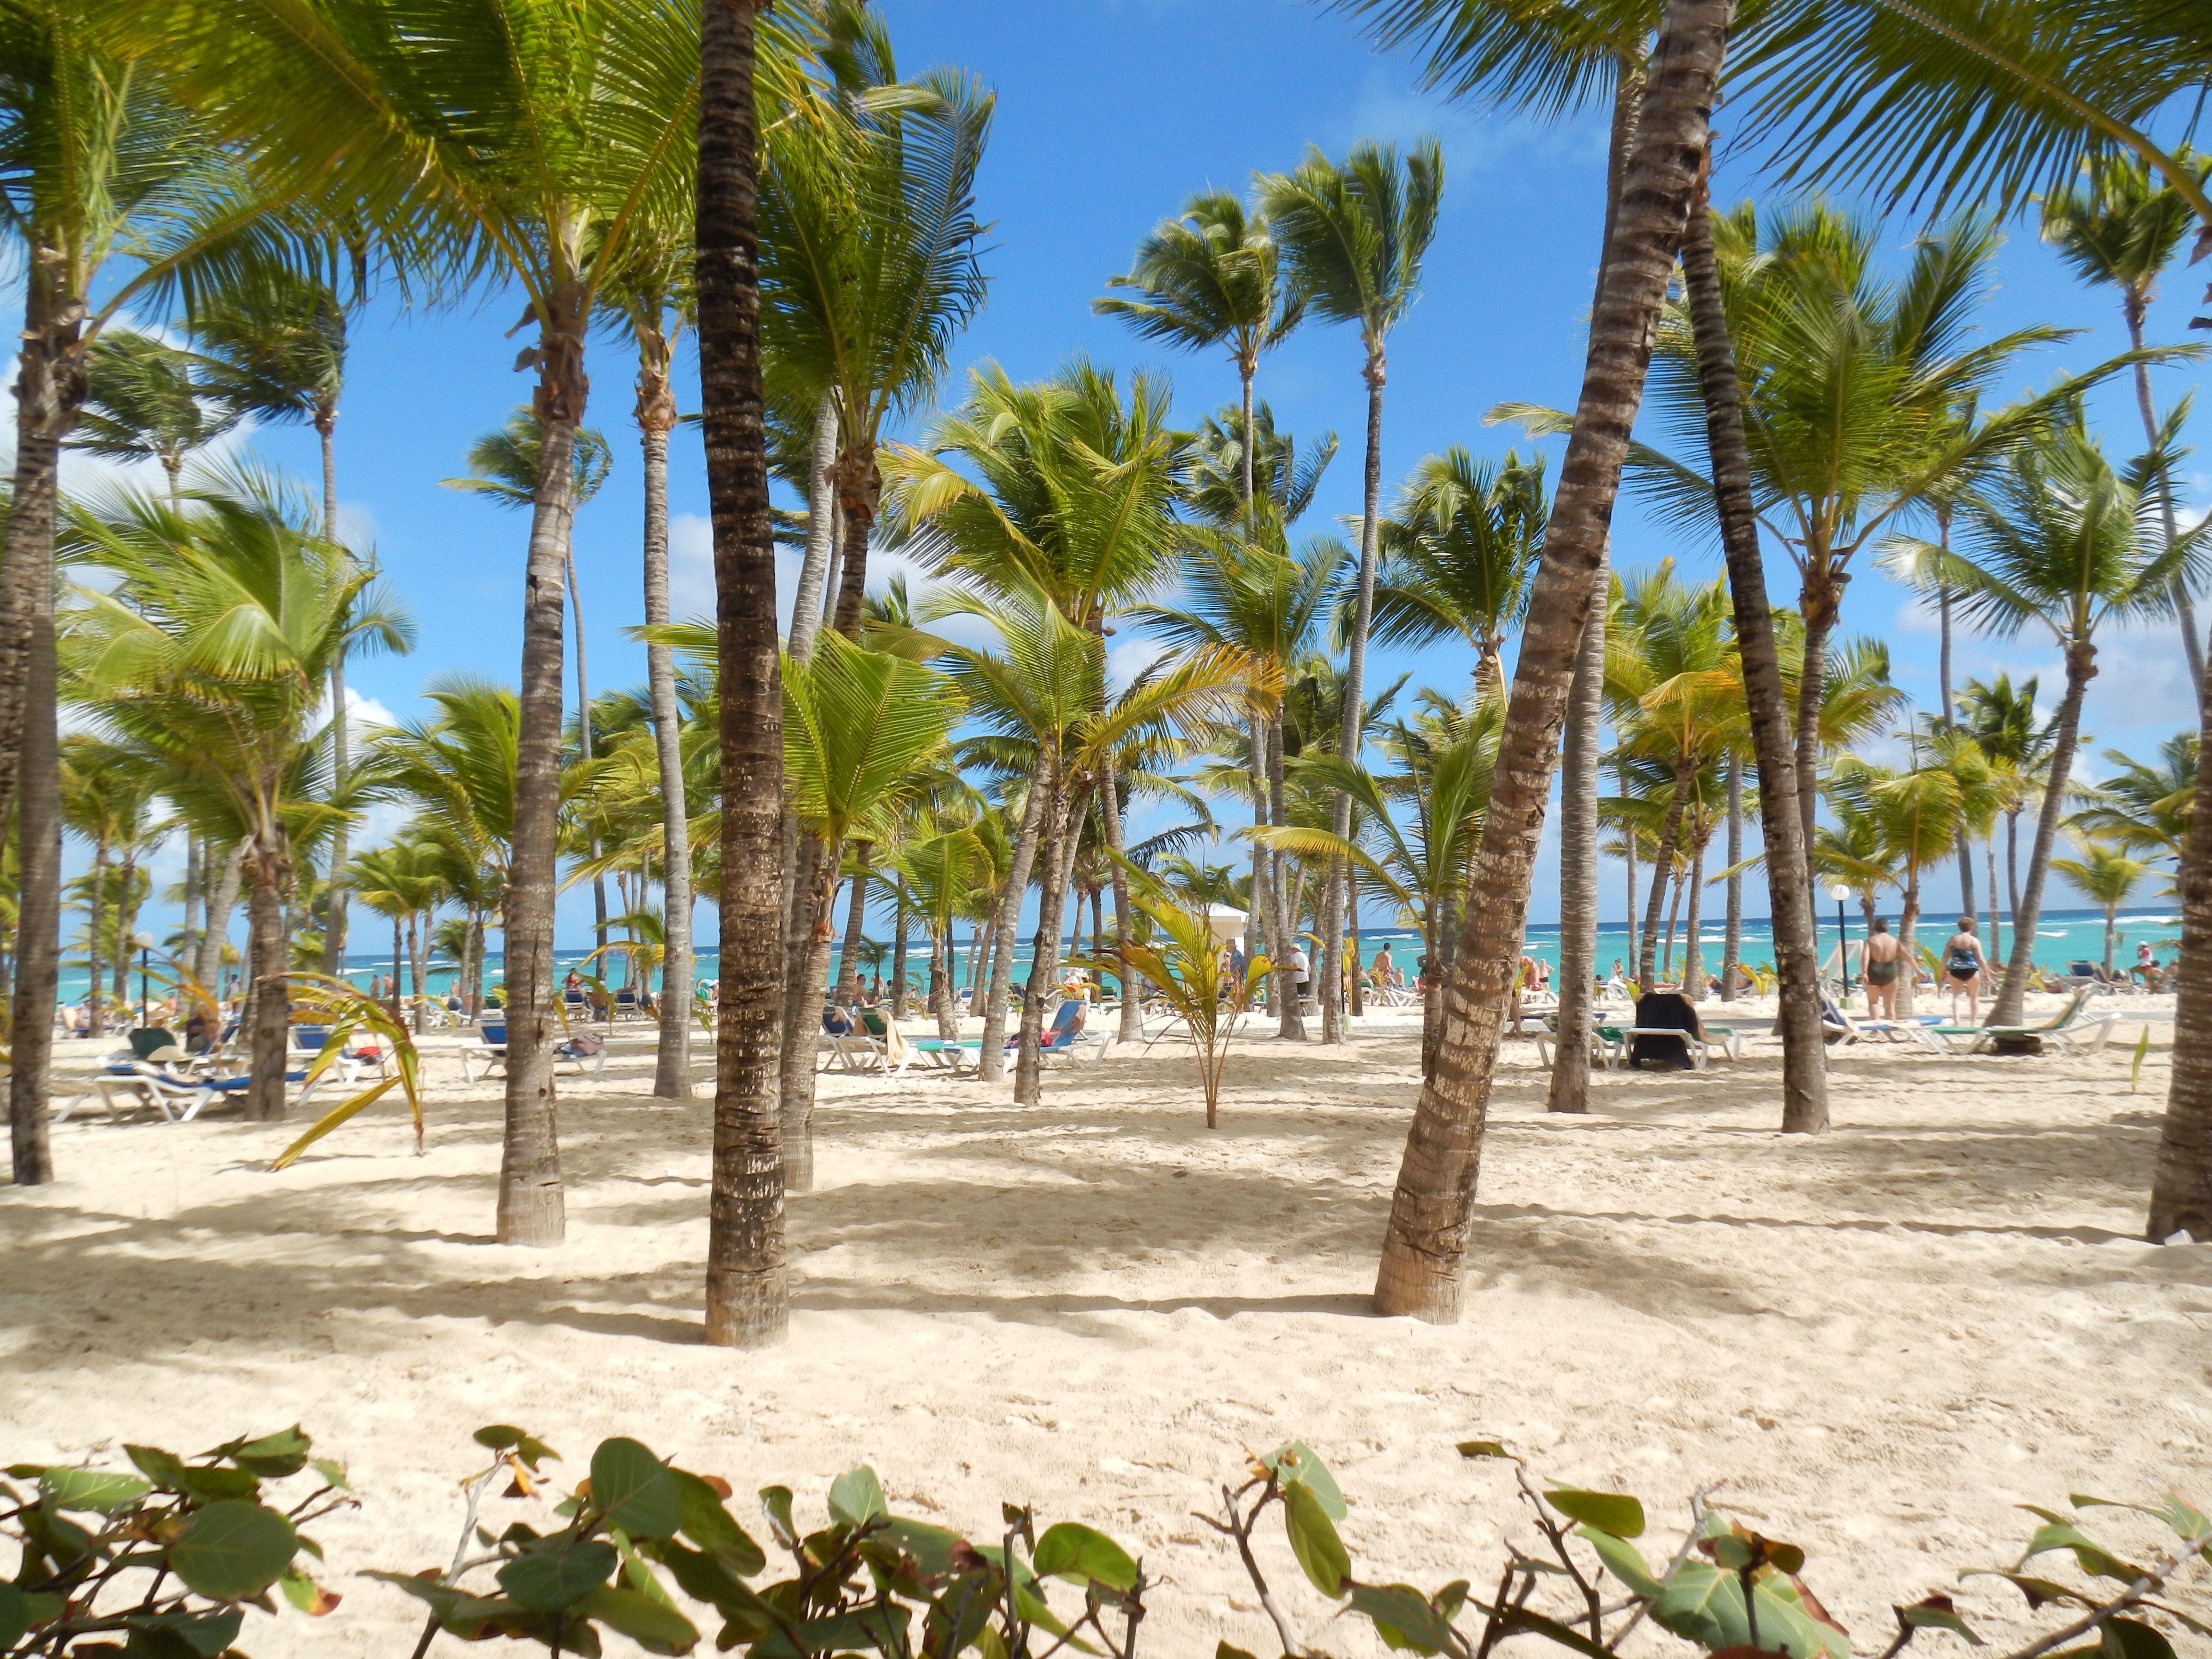 Enjoy The Hotel Riu Palace Punta Cana